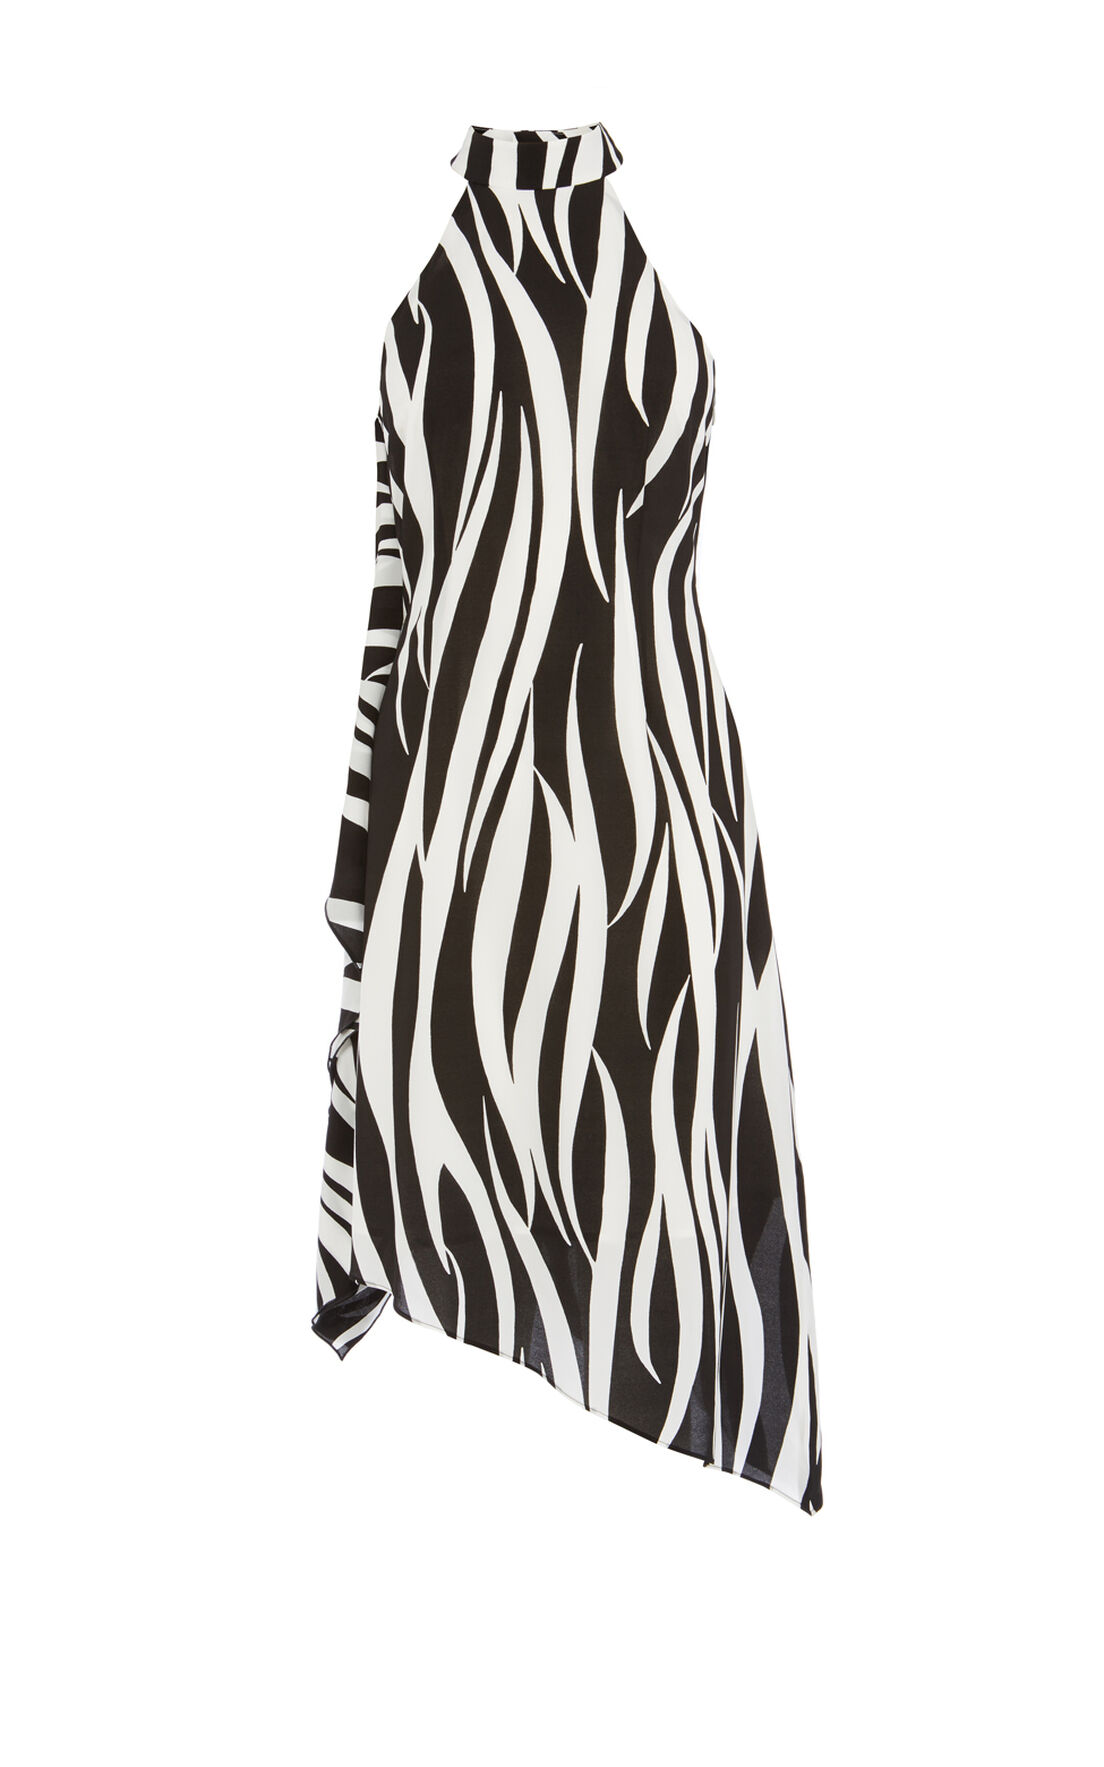 Karen Millen, DV307 OVERSIZE GRAPHIC ZEBRA Zebra Prnt 0